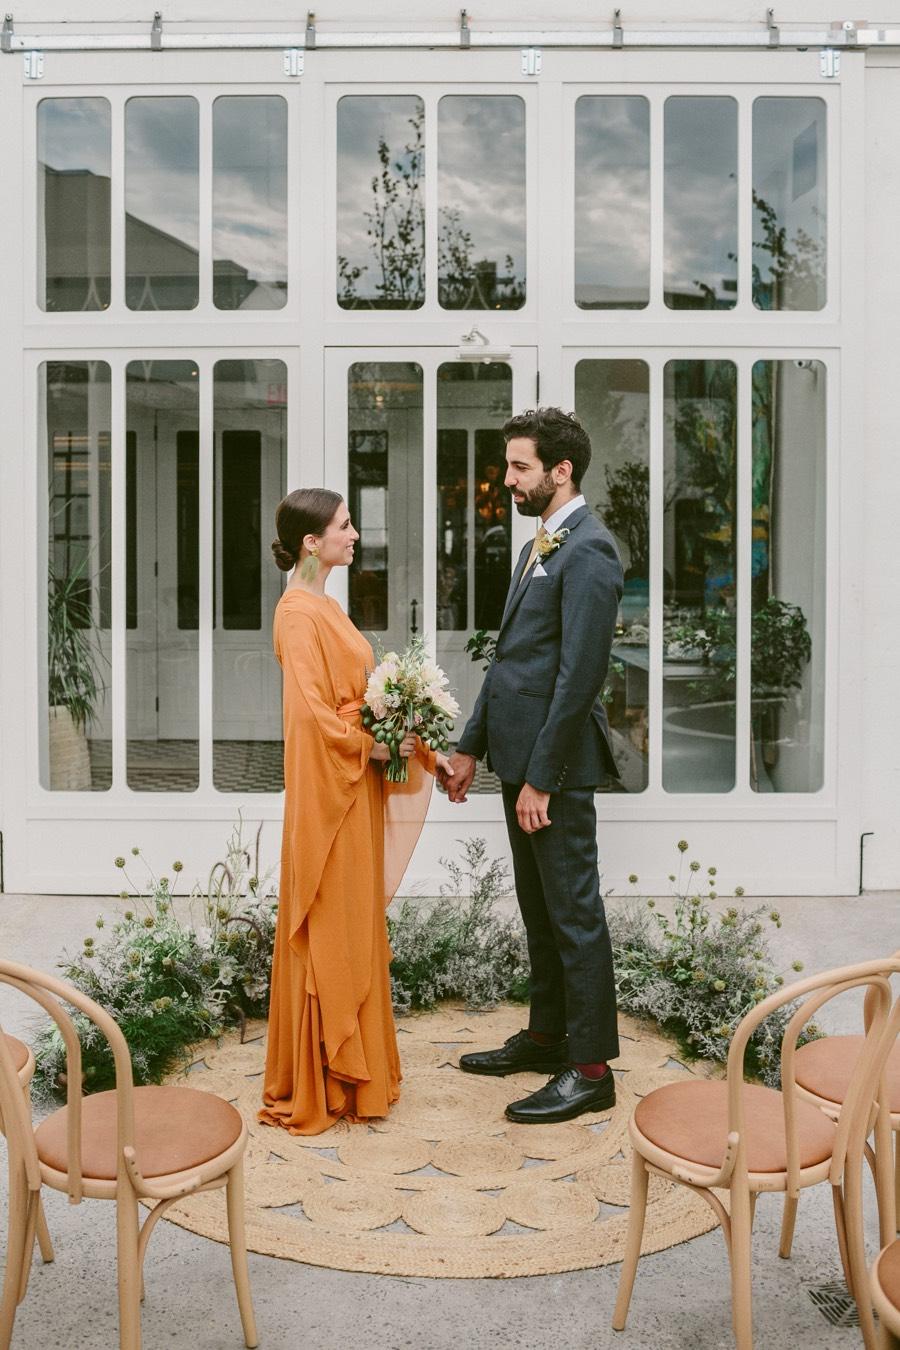 suraya wedding ceremony